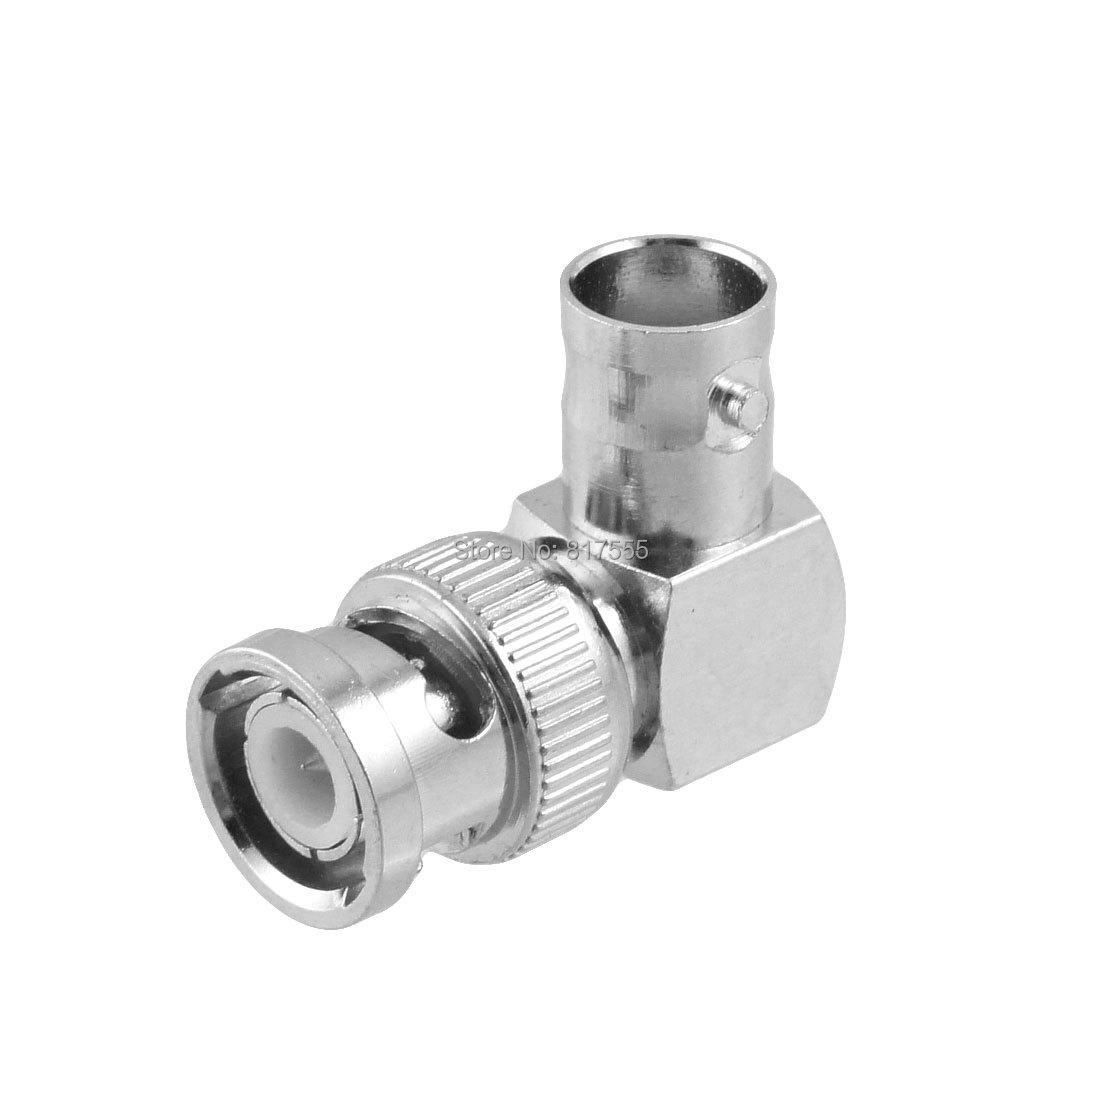 Гаджет  BNC Female to Male CCTV Coaxial Cable Coupler Adapter Connector None Электротехническое оборудование и материалы